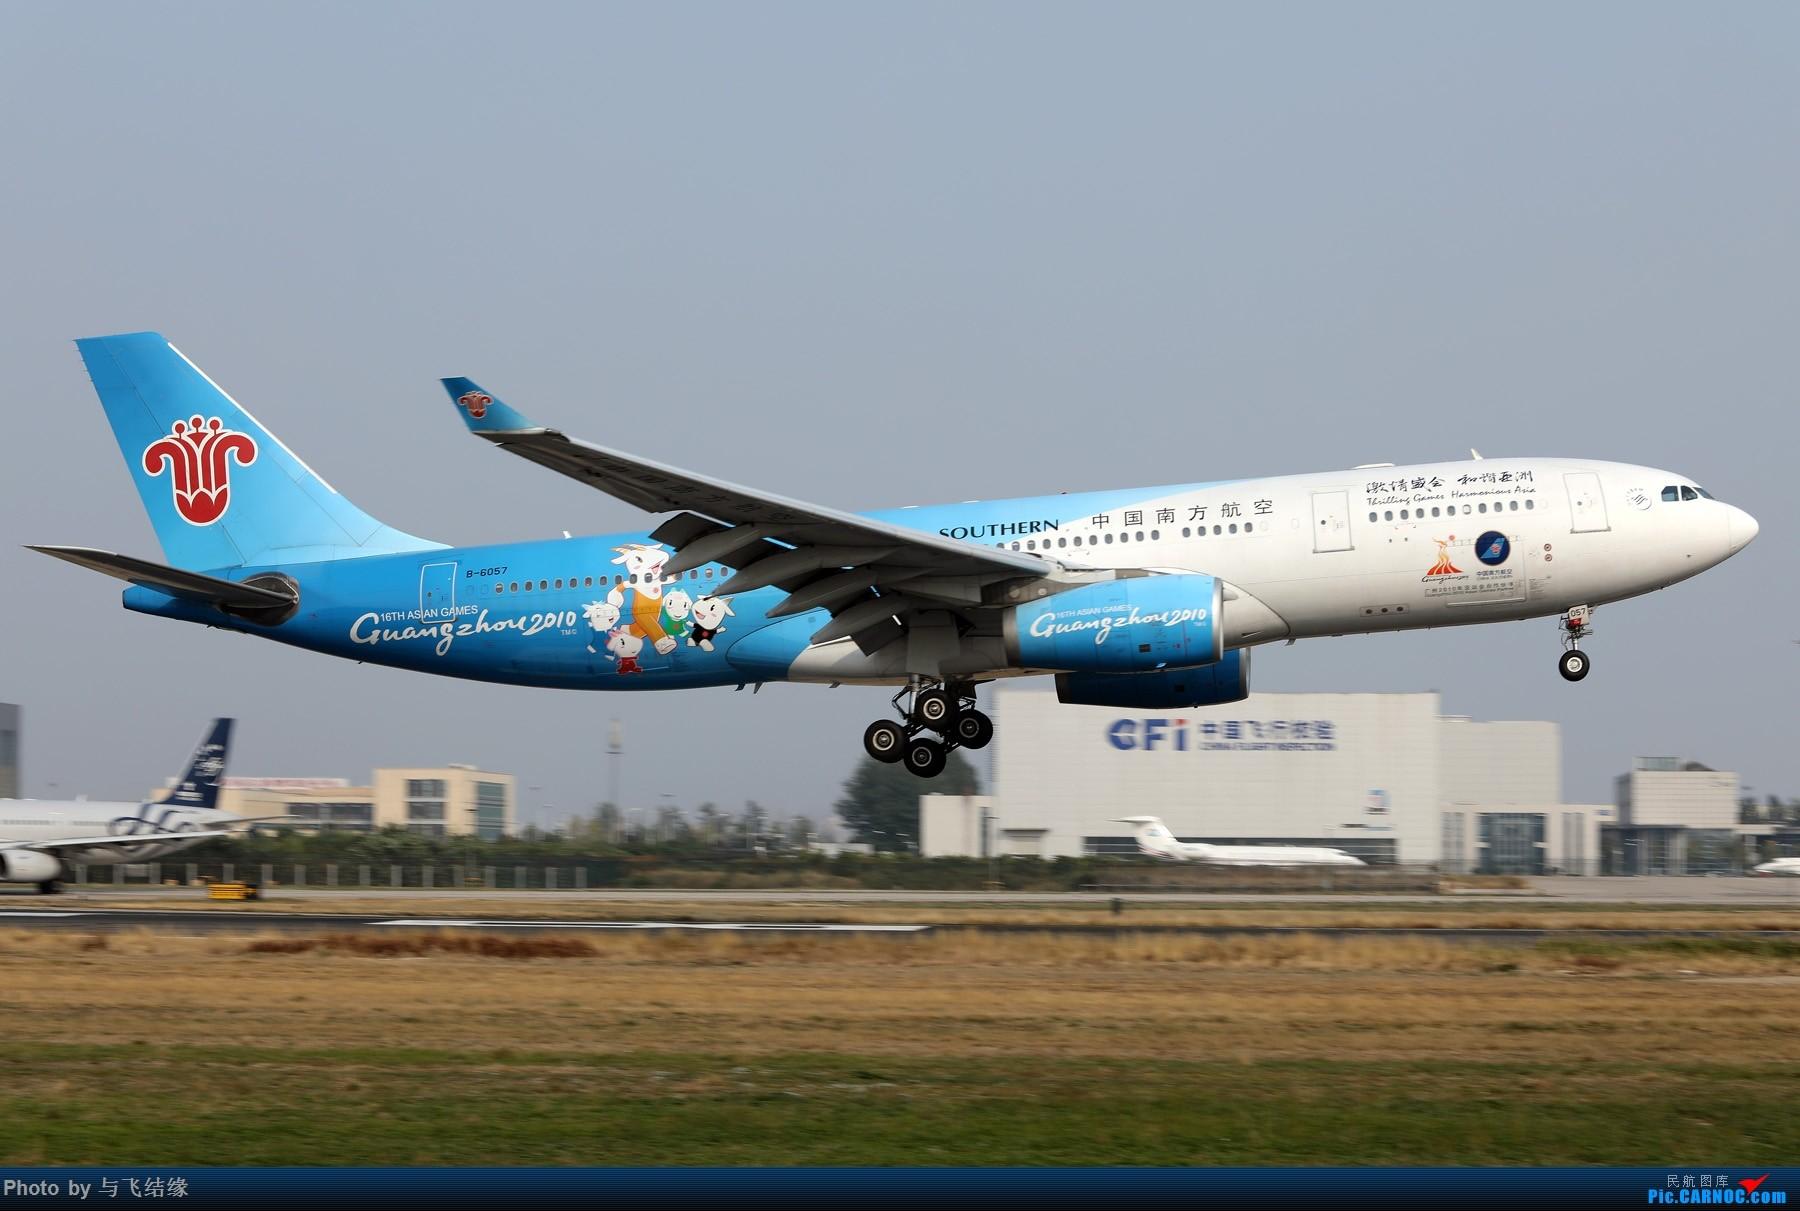 Re:南航Airbus A330-200,B-6057的这身衣服终于换了在看看,永远留在记忆里。 AIRBUS A330-200 B-6057 中国北京首都国际机场